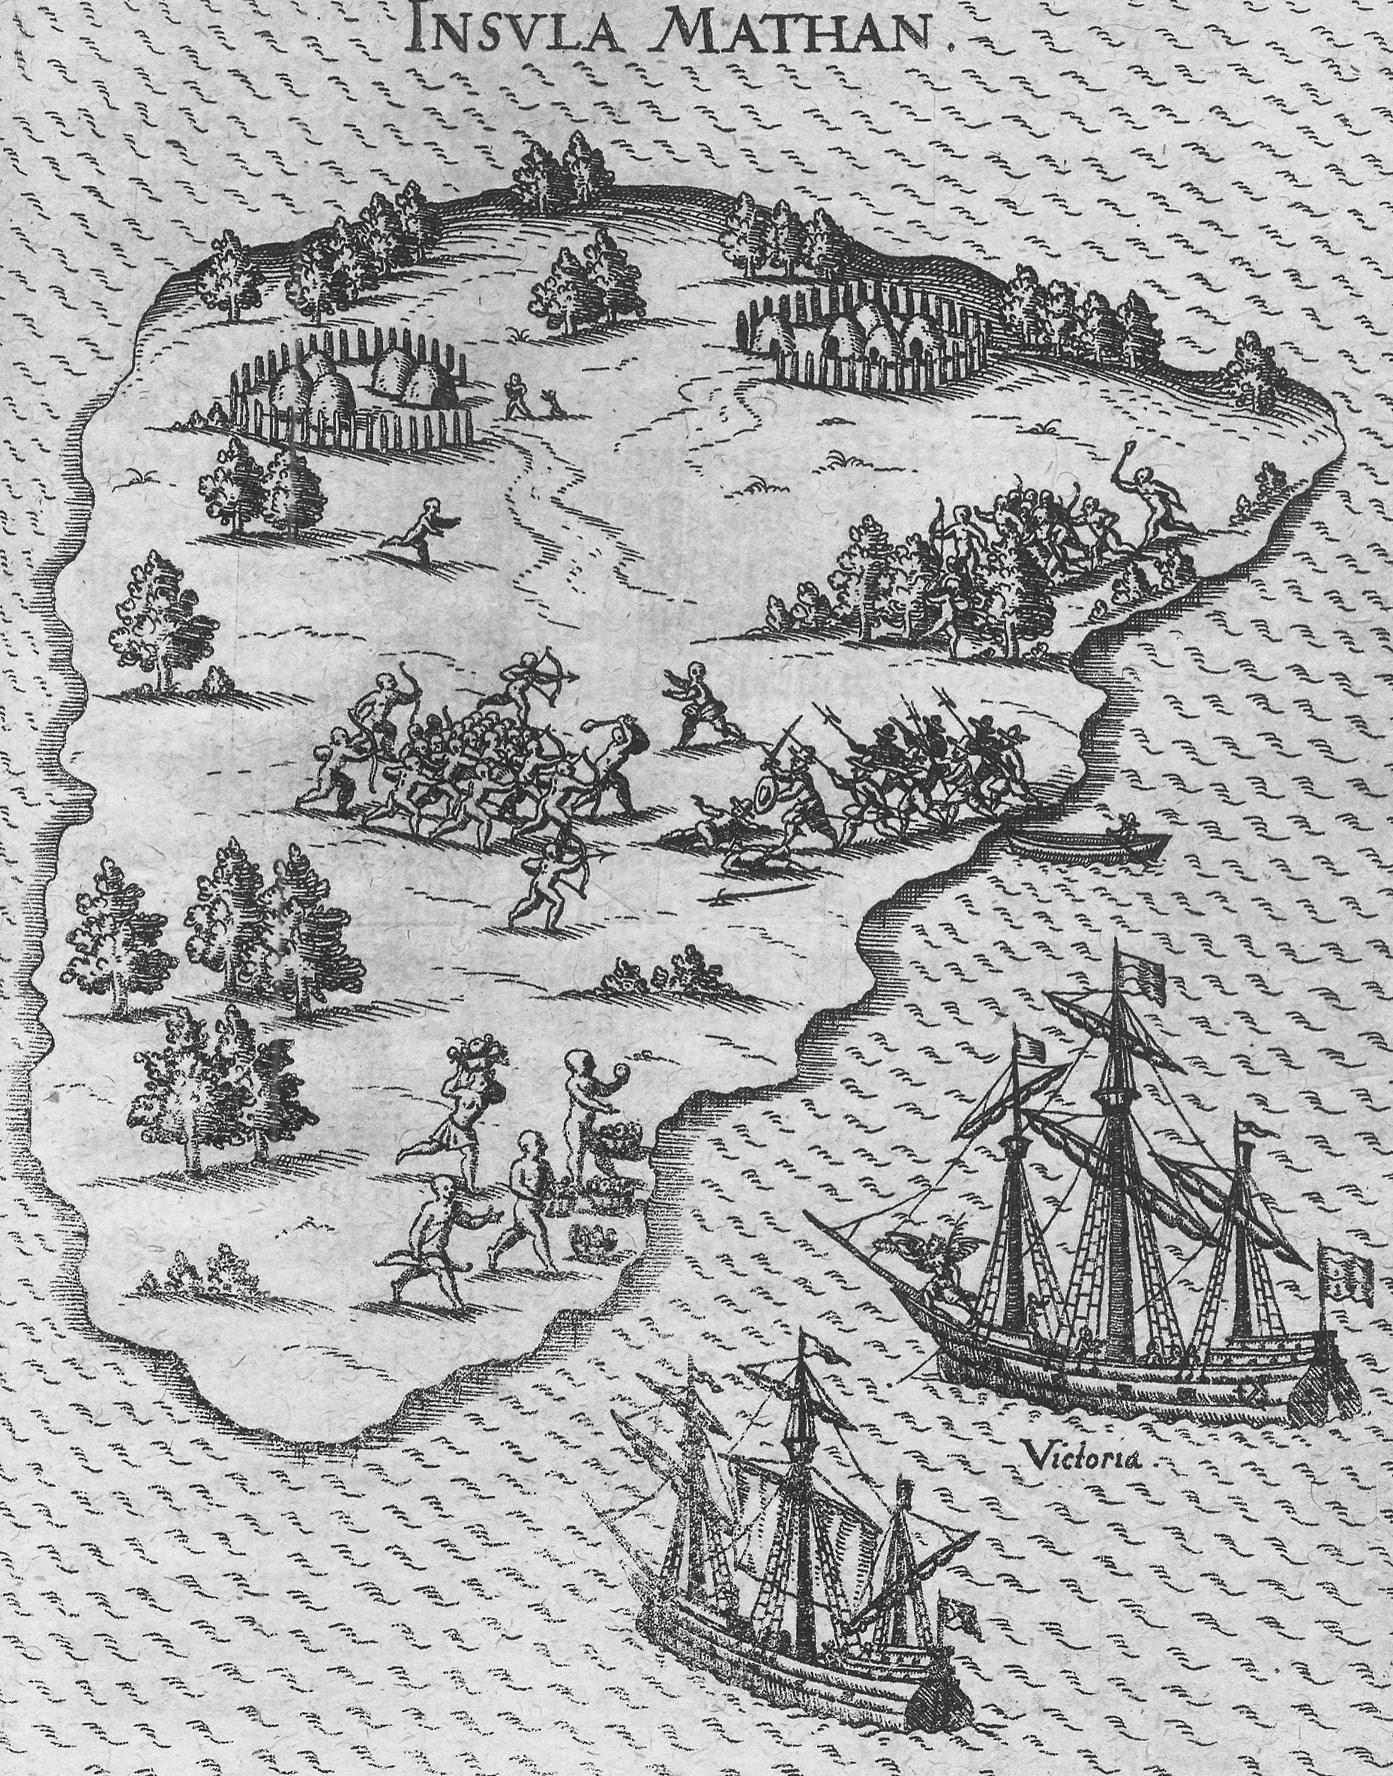 http://libweb5.princeton.edu/visual_materials/maps/websites/pacific/magellan/magellan-death.jpg